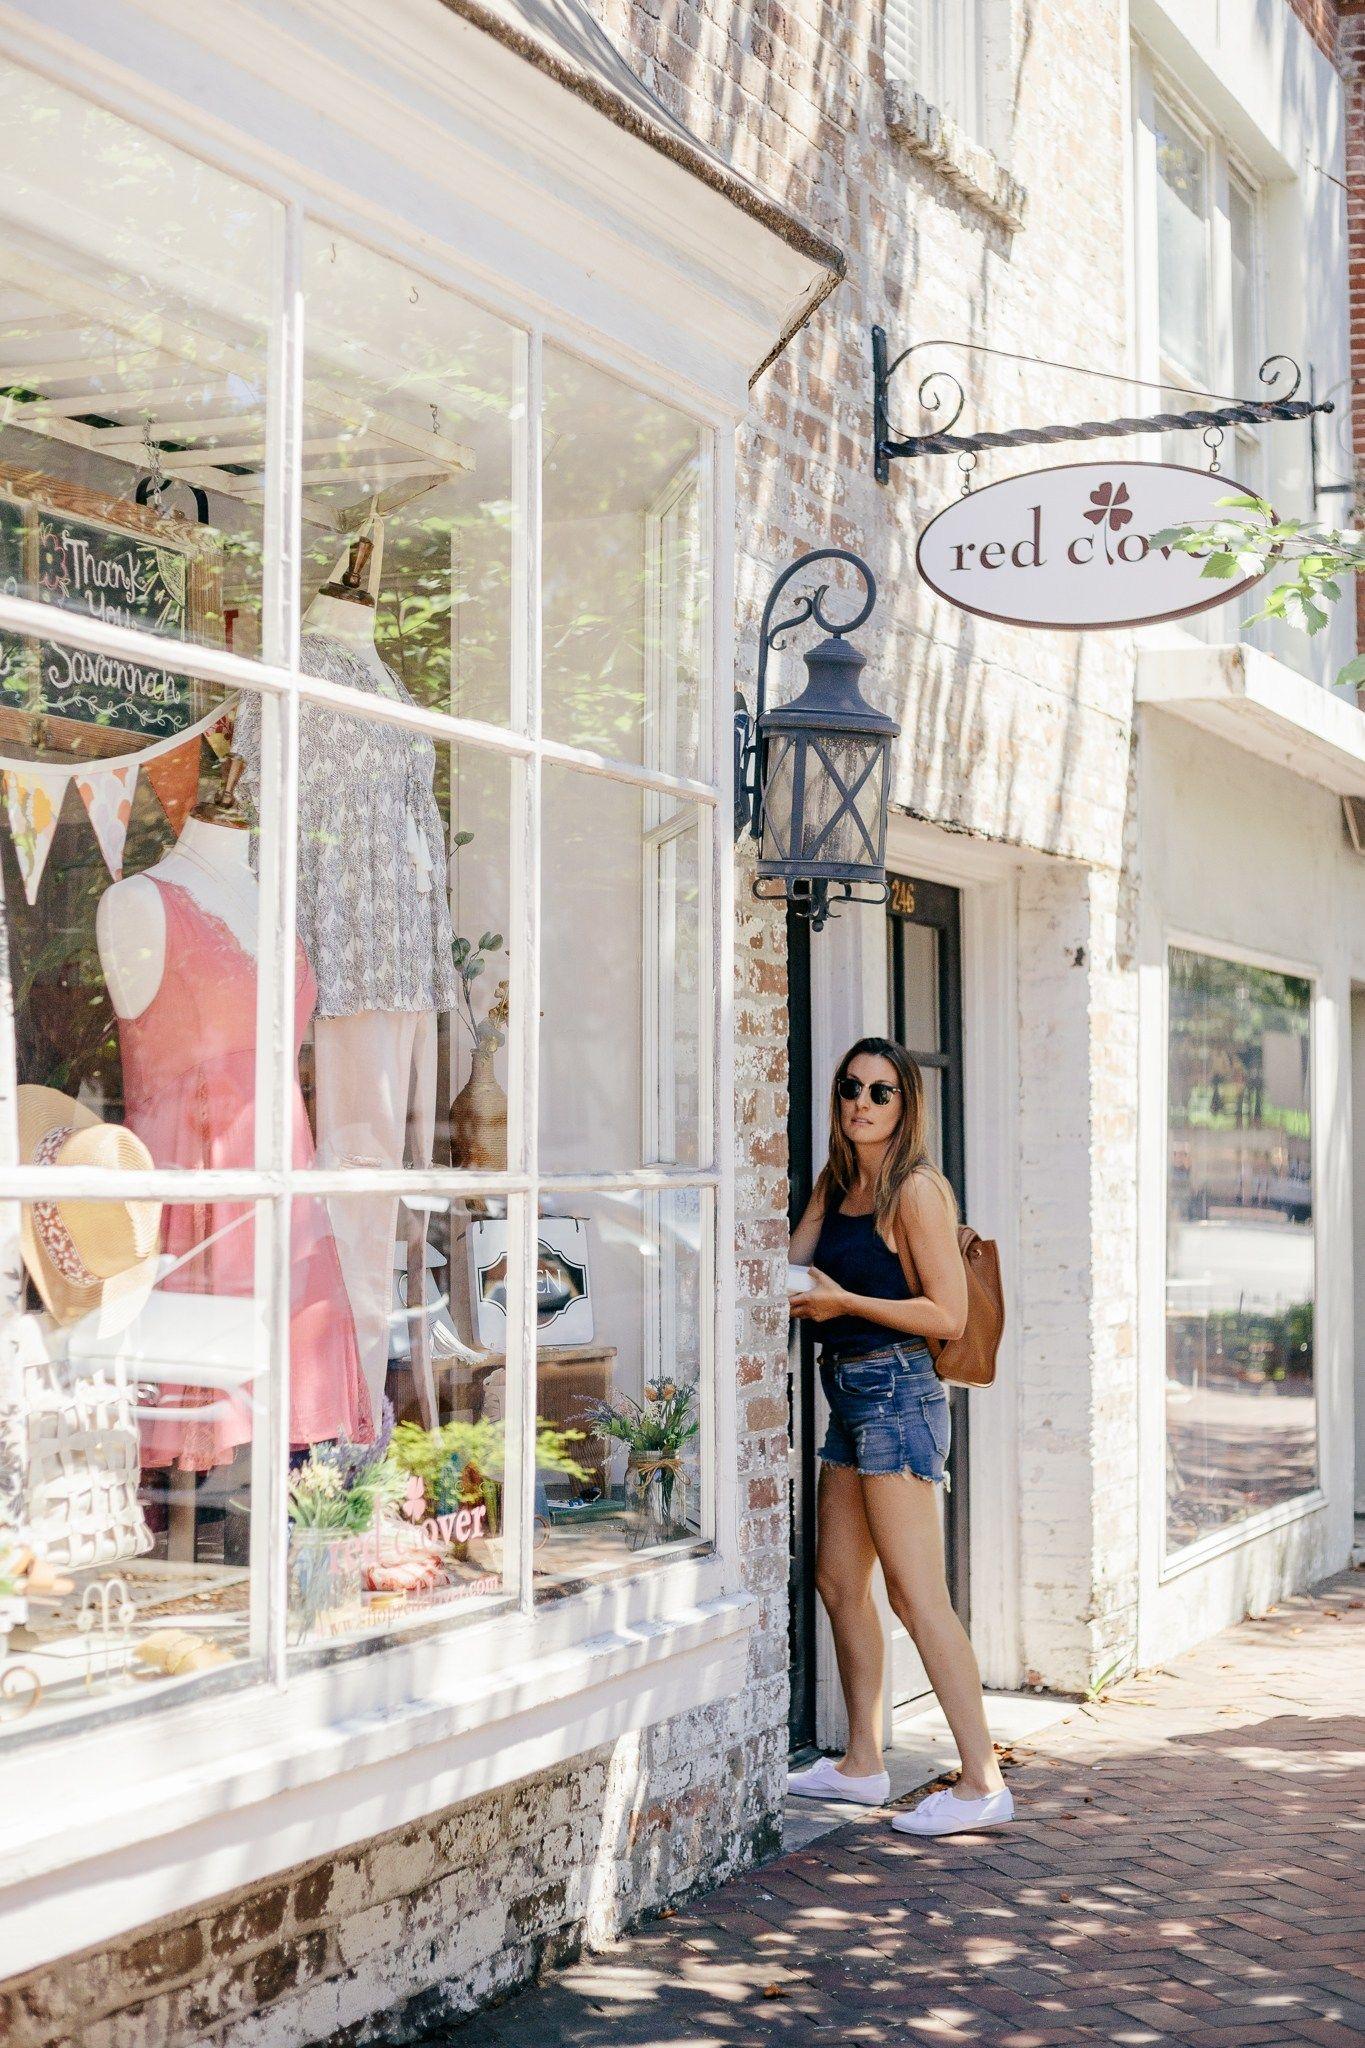 A Savannah Ga City Guide Where To Eat Shop Walk Sara Magnolia Savannah Chat Downtown Savannah Travel Savannah